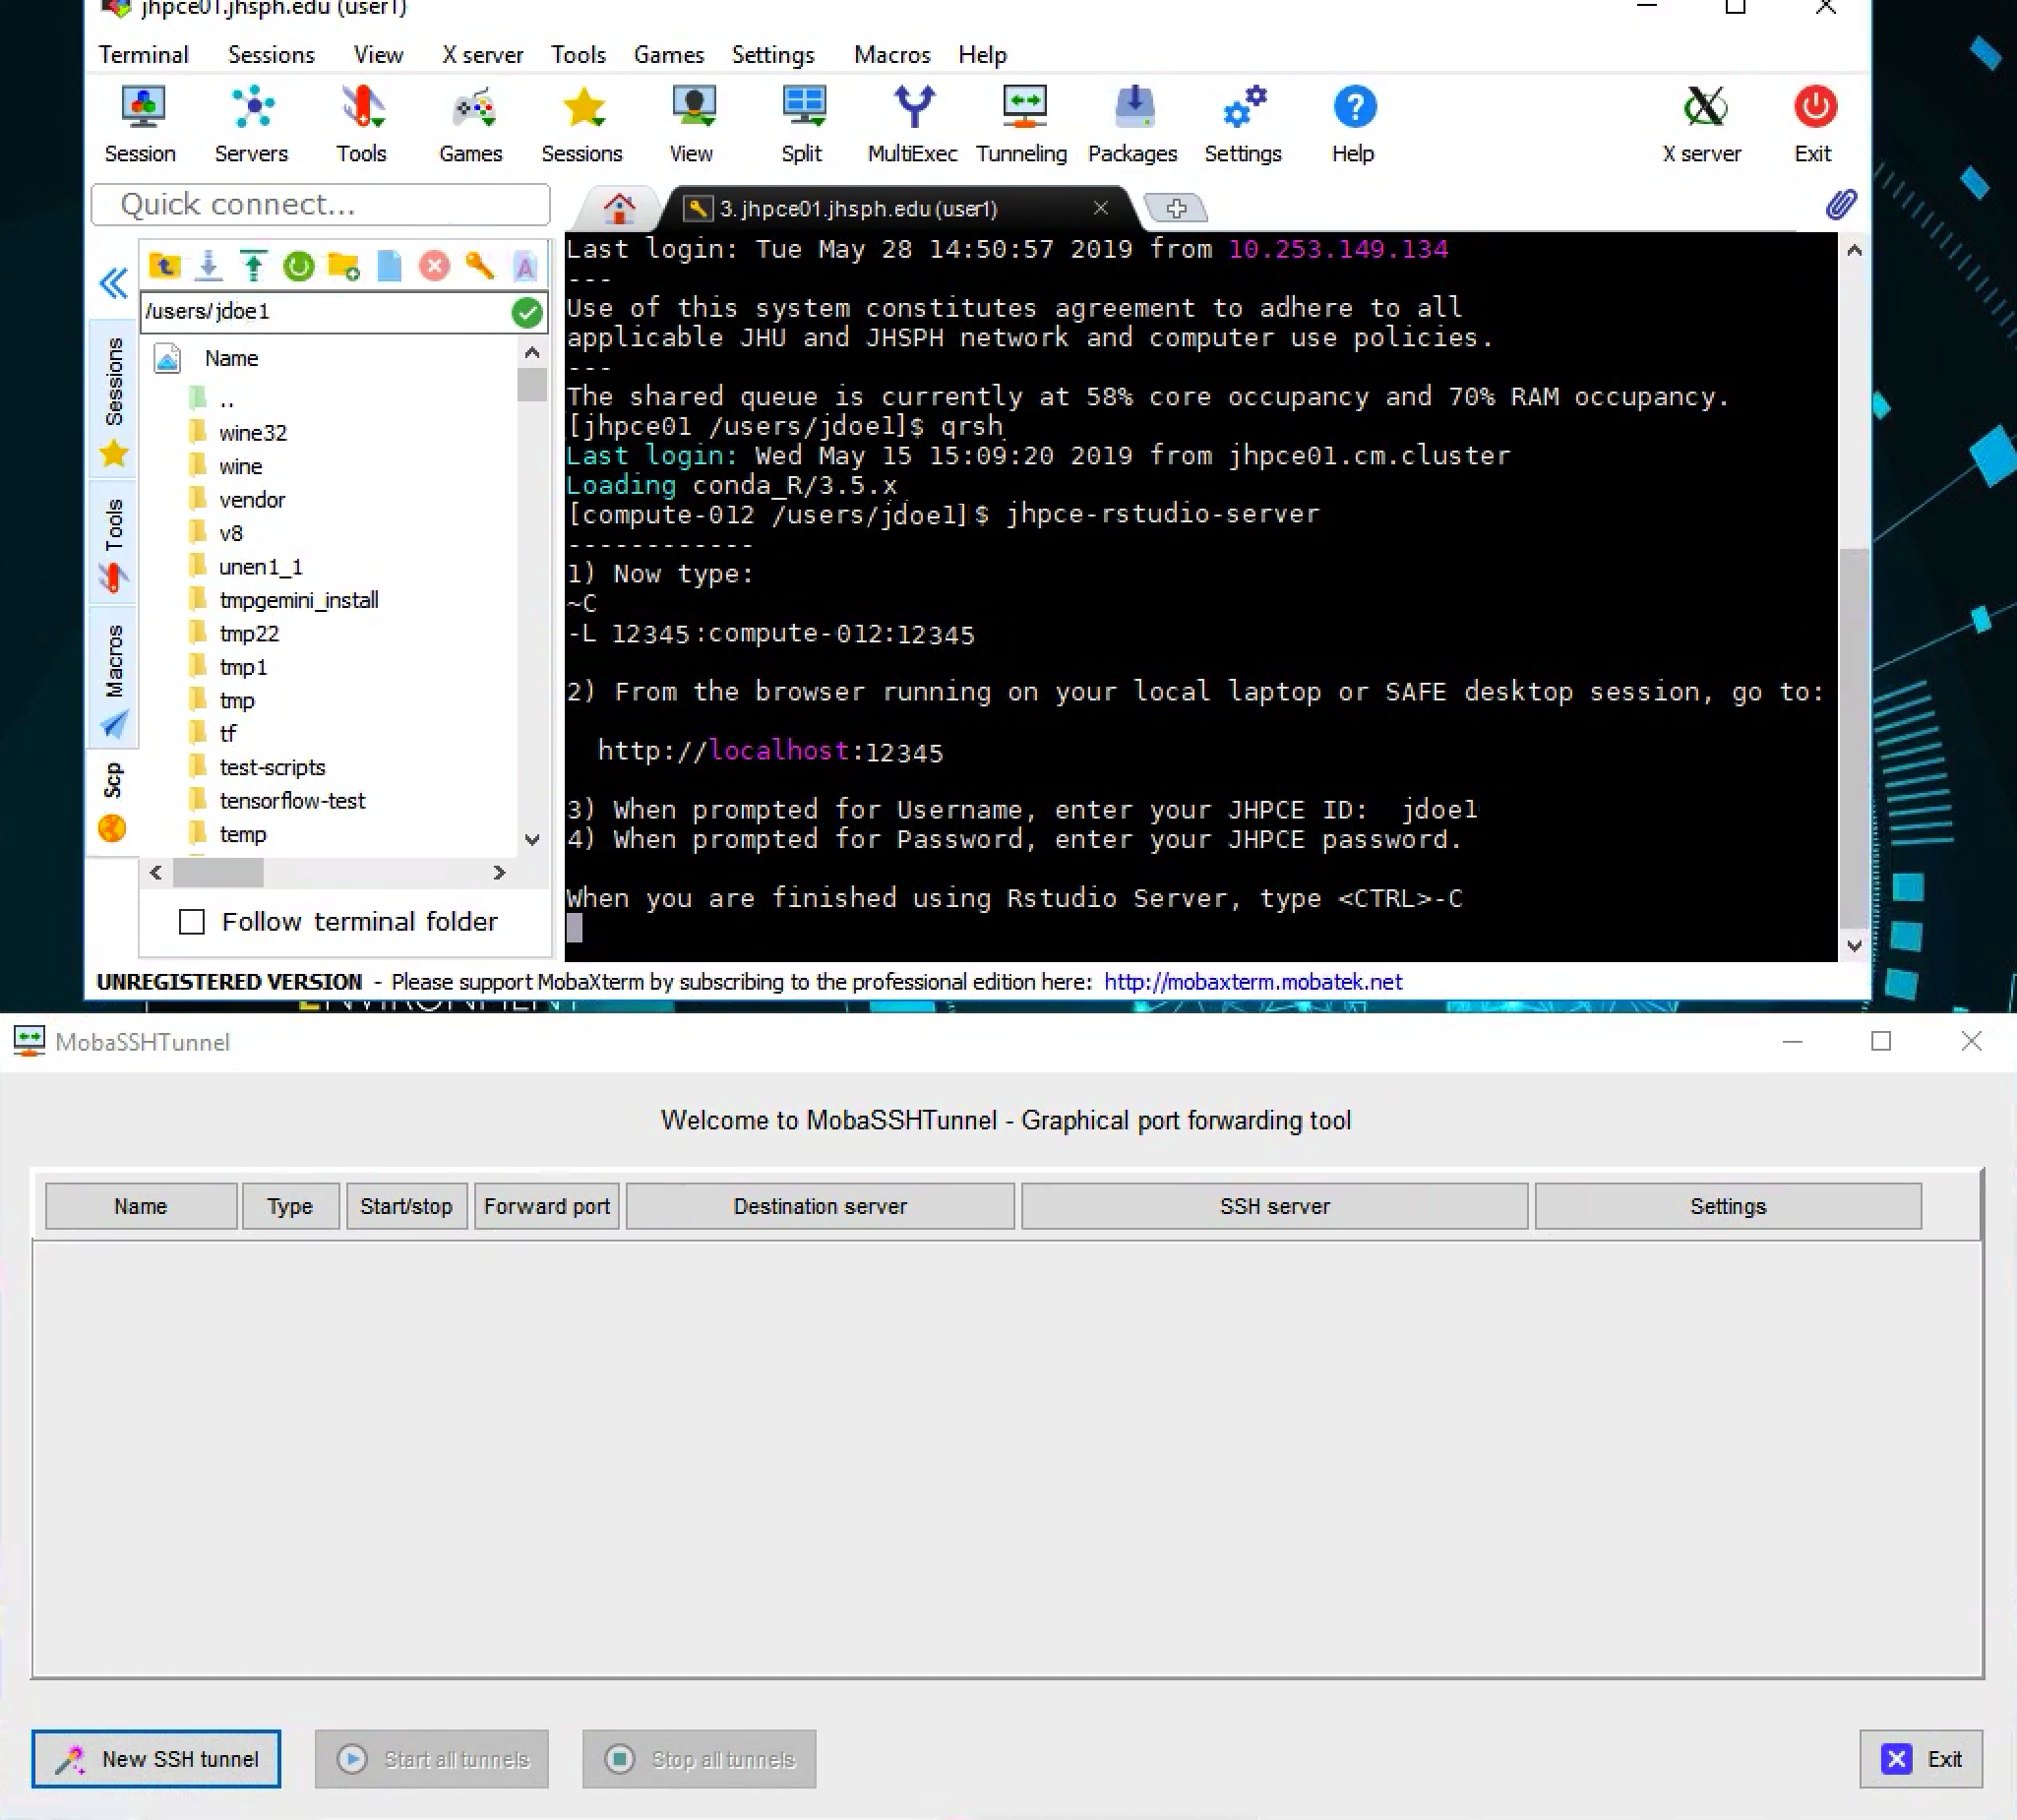 Running Rstudio Server on the JHPCE cluster | Joint HPC Exchange